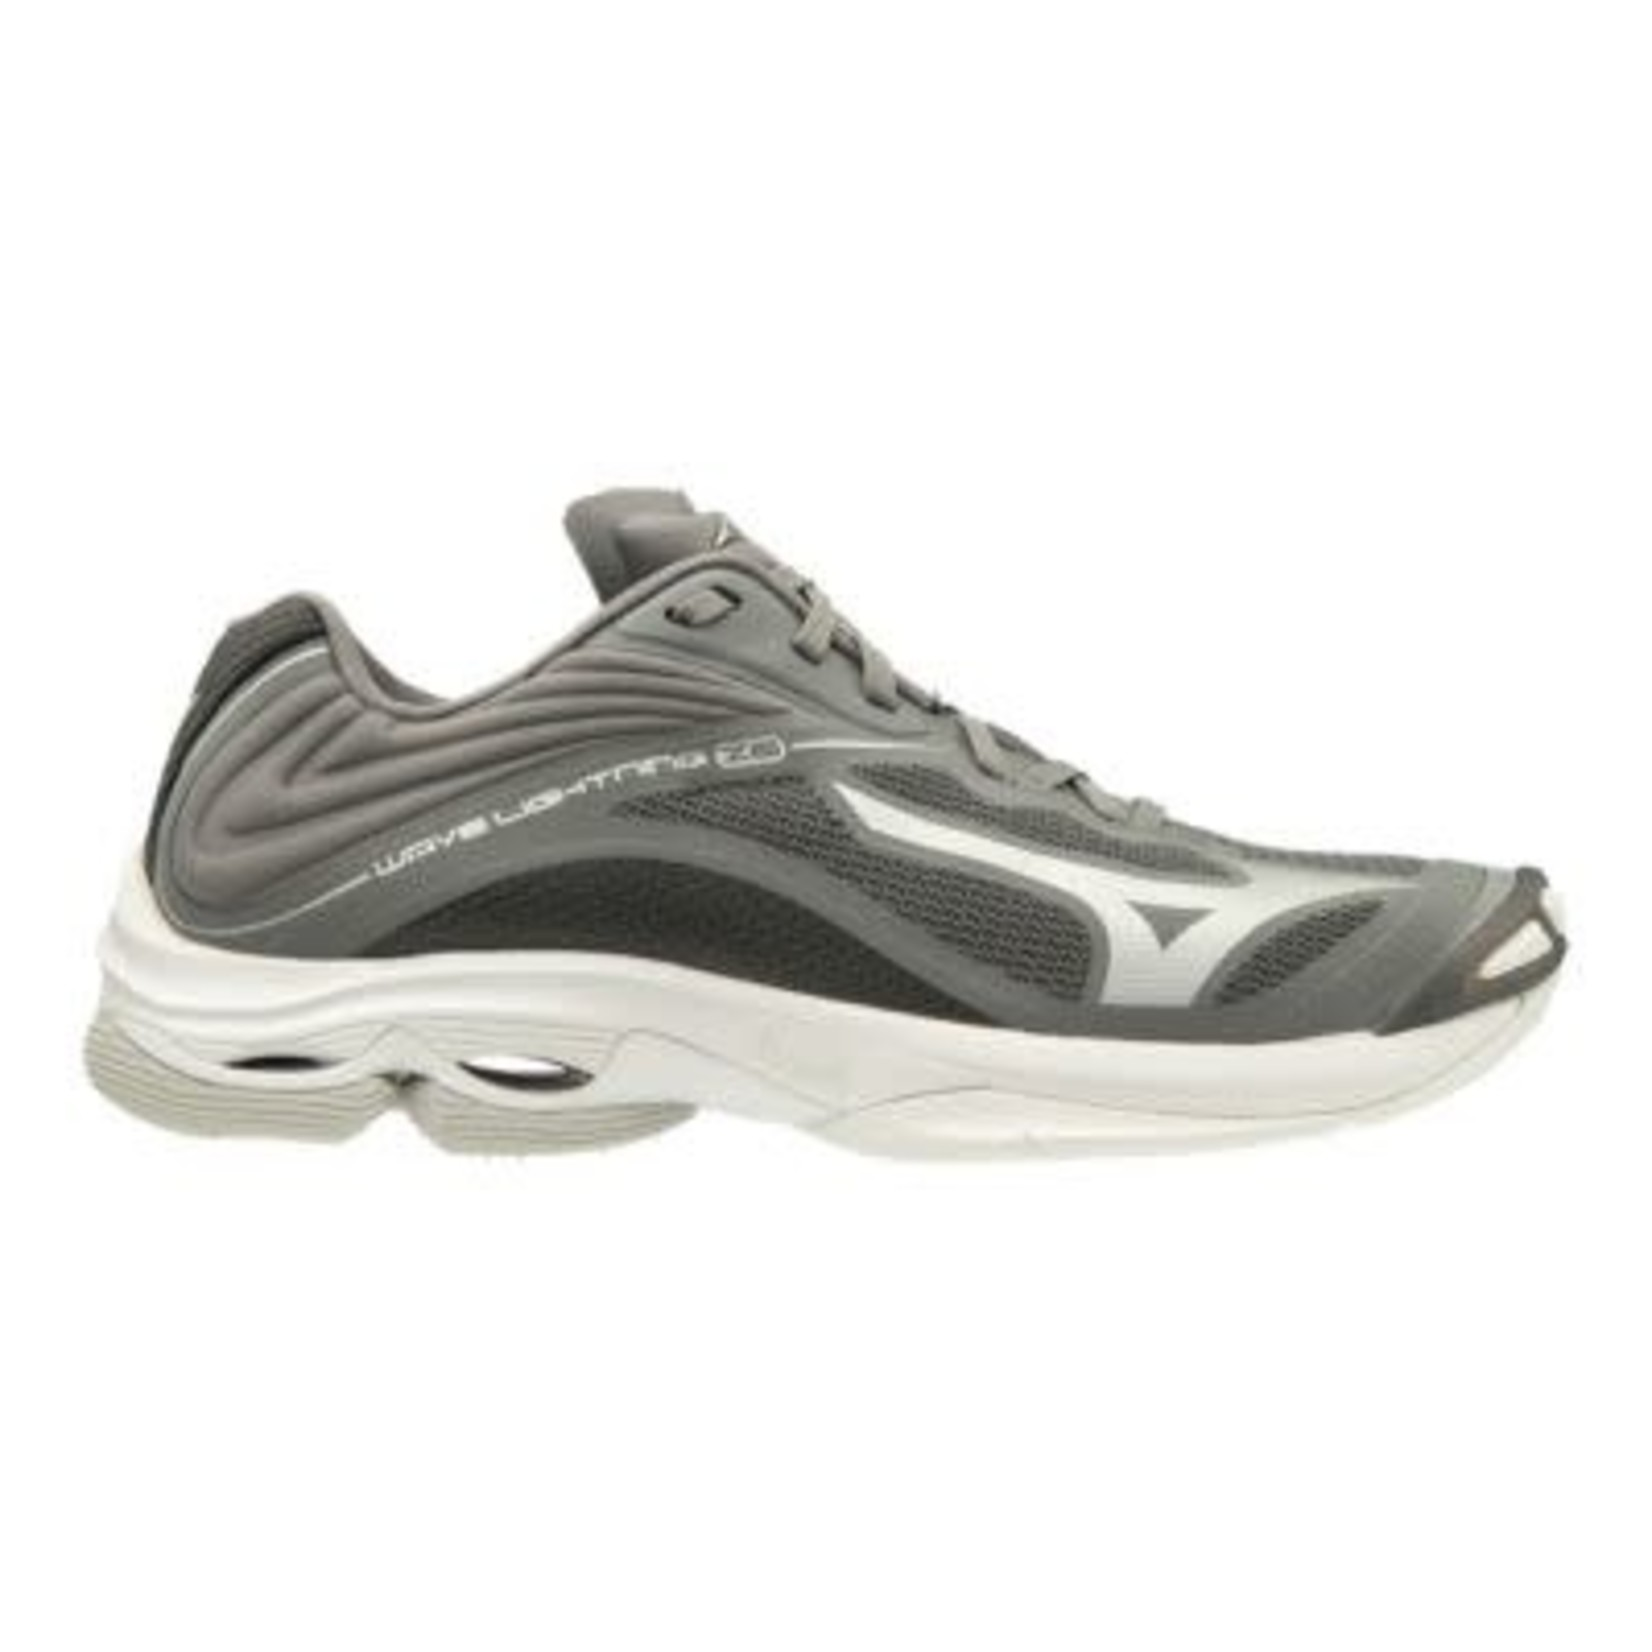 Mizuno Mizuno Volleyball Shoes, Wave Lightning Z6, Mens